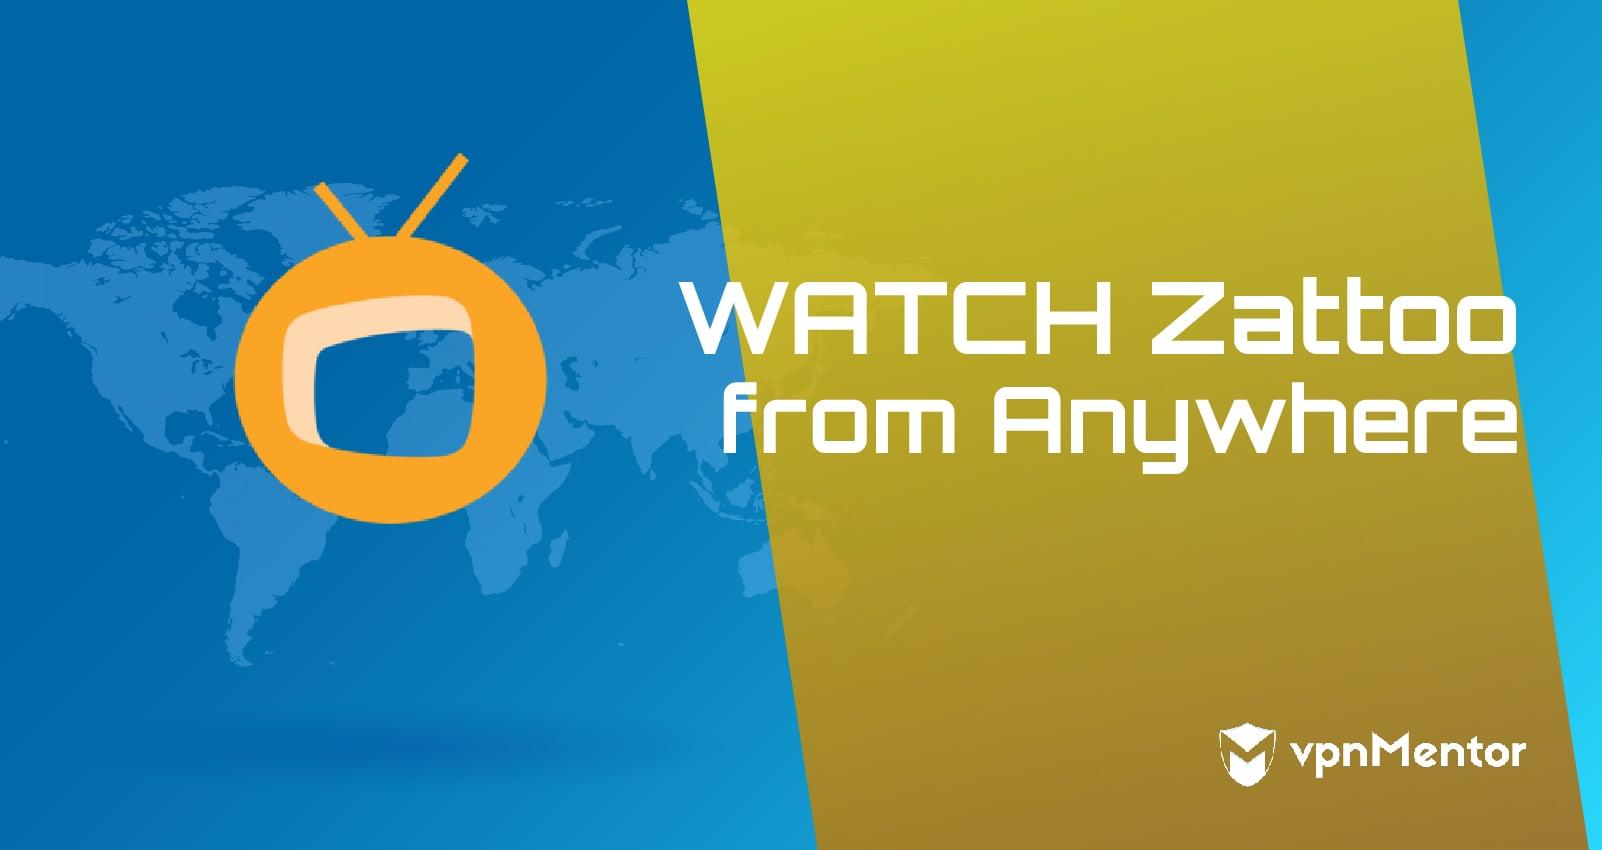 Watch Zattoo Anywhere